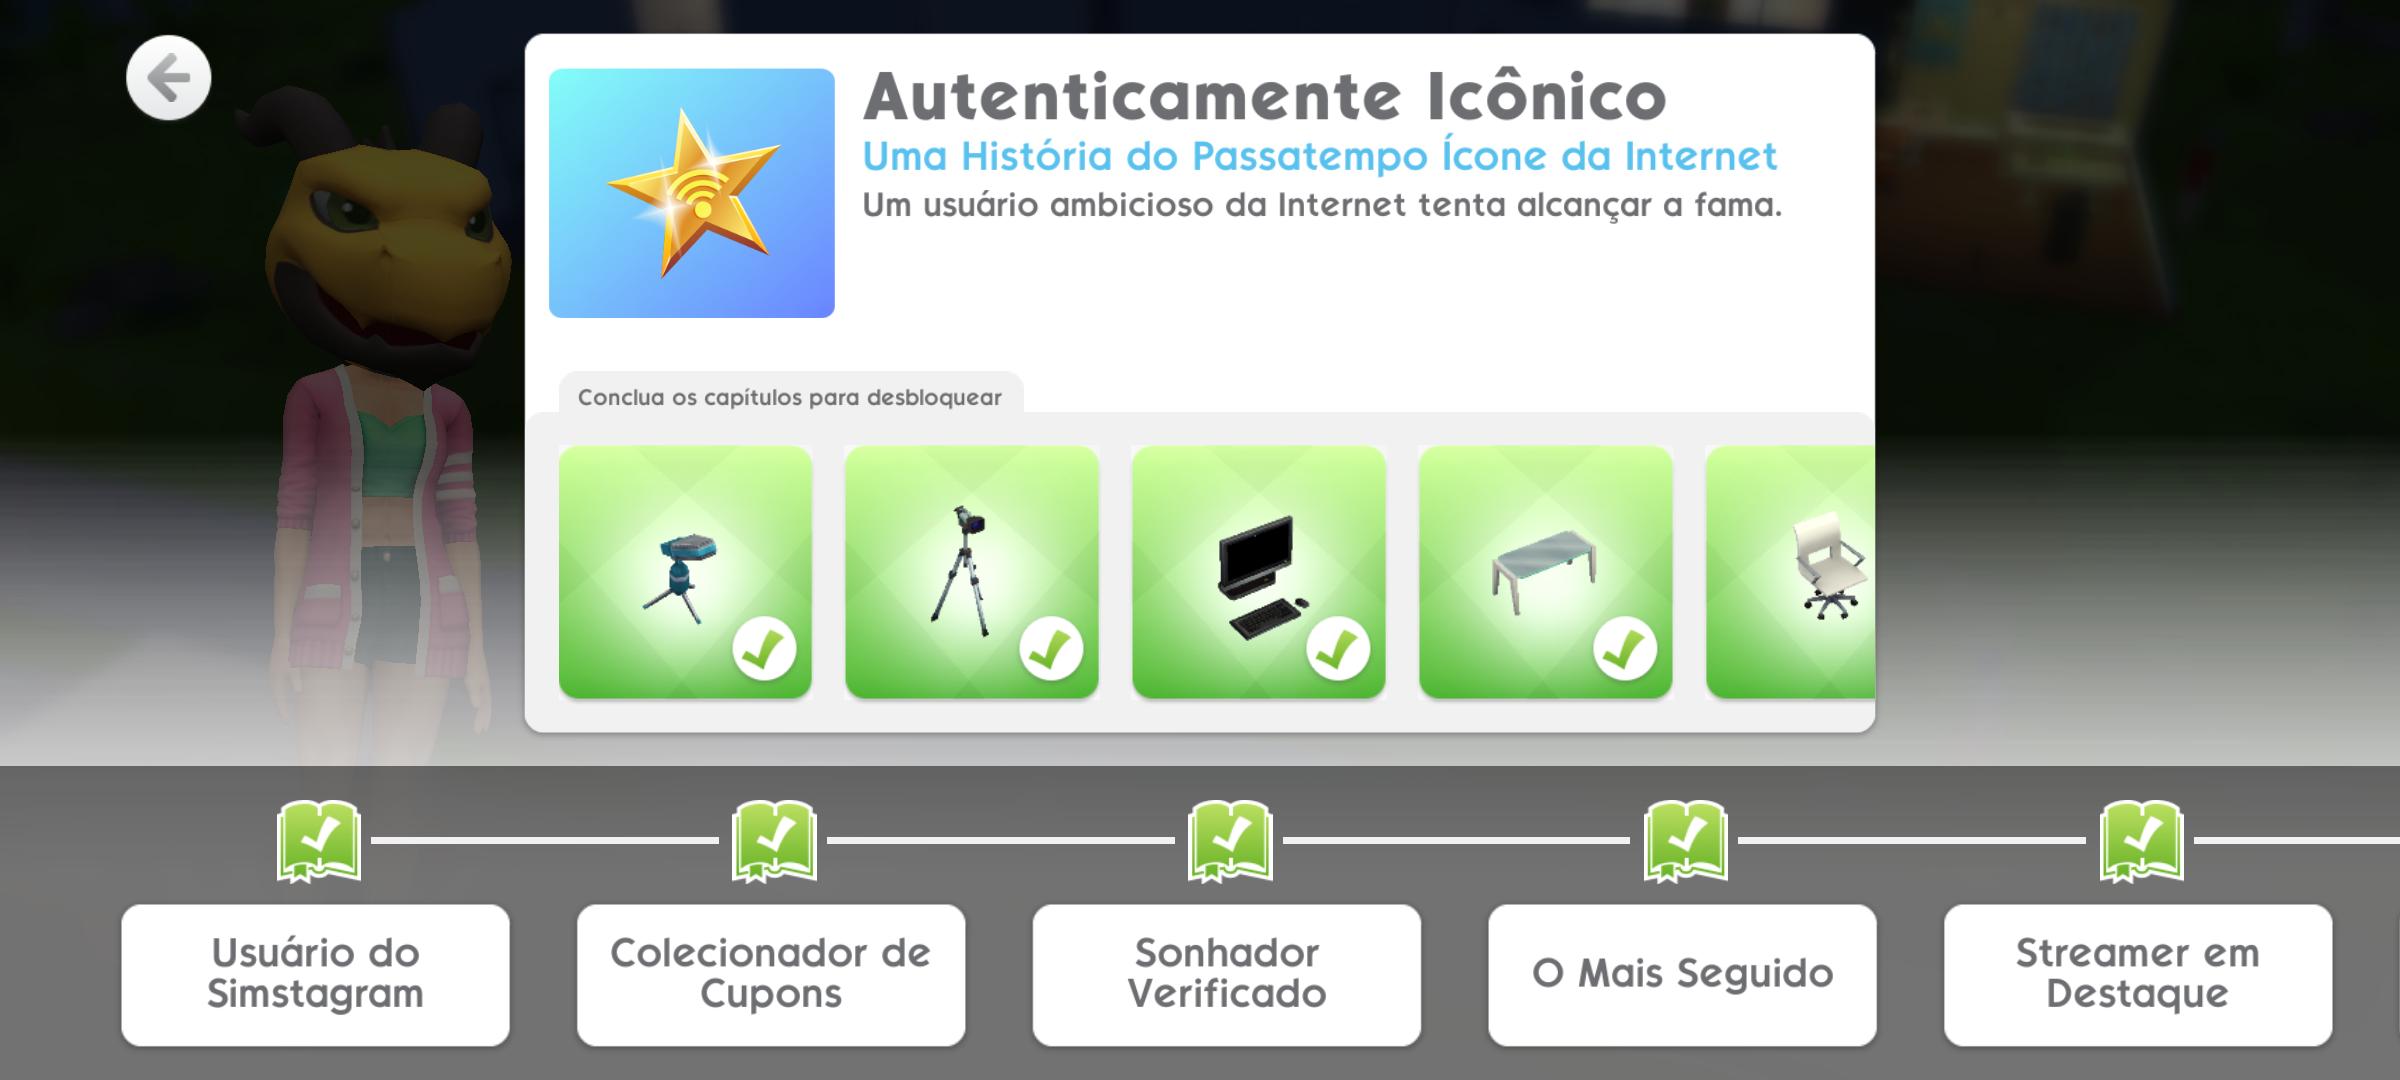 The sims mobile dinheiro infinito